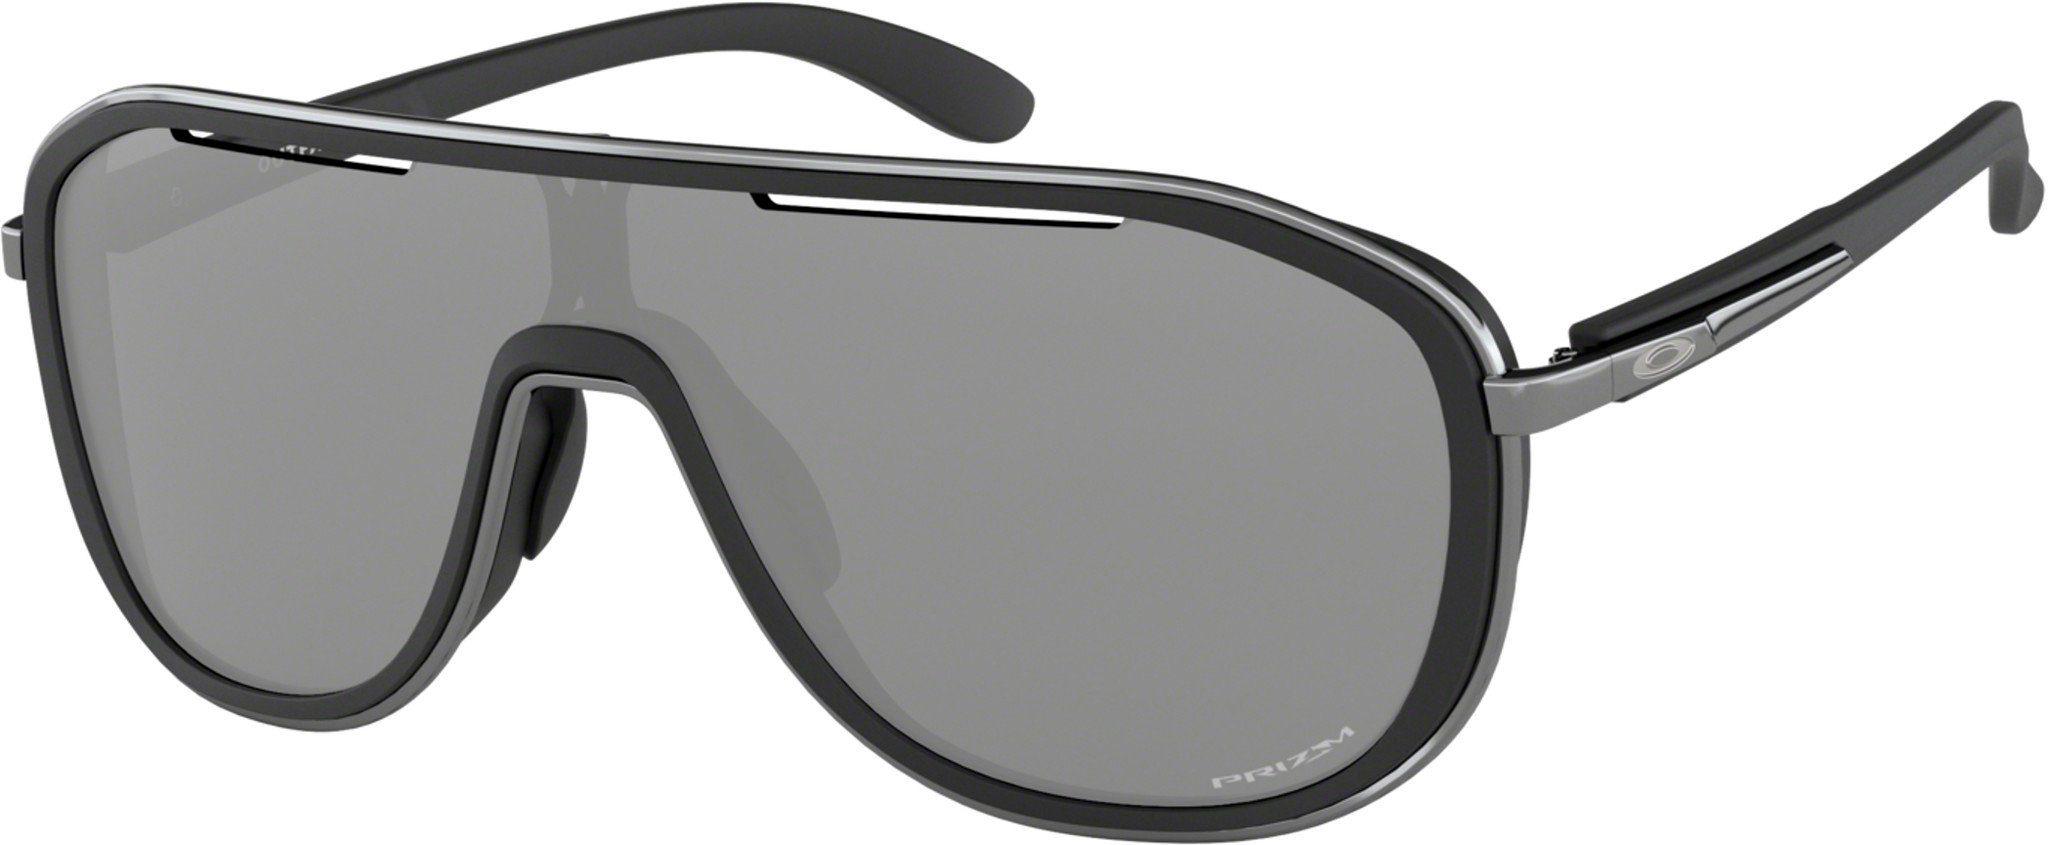 Oakley Sportbrille »Outpace Sunglasses«